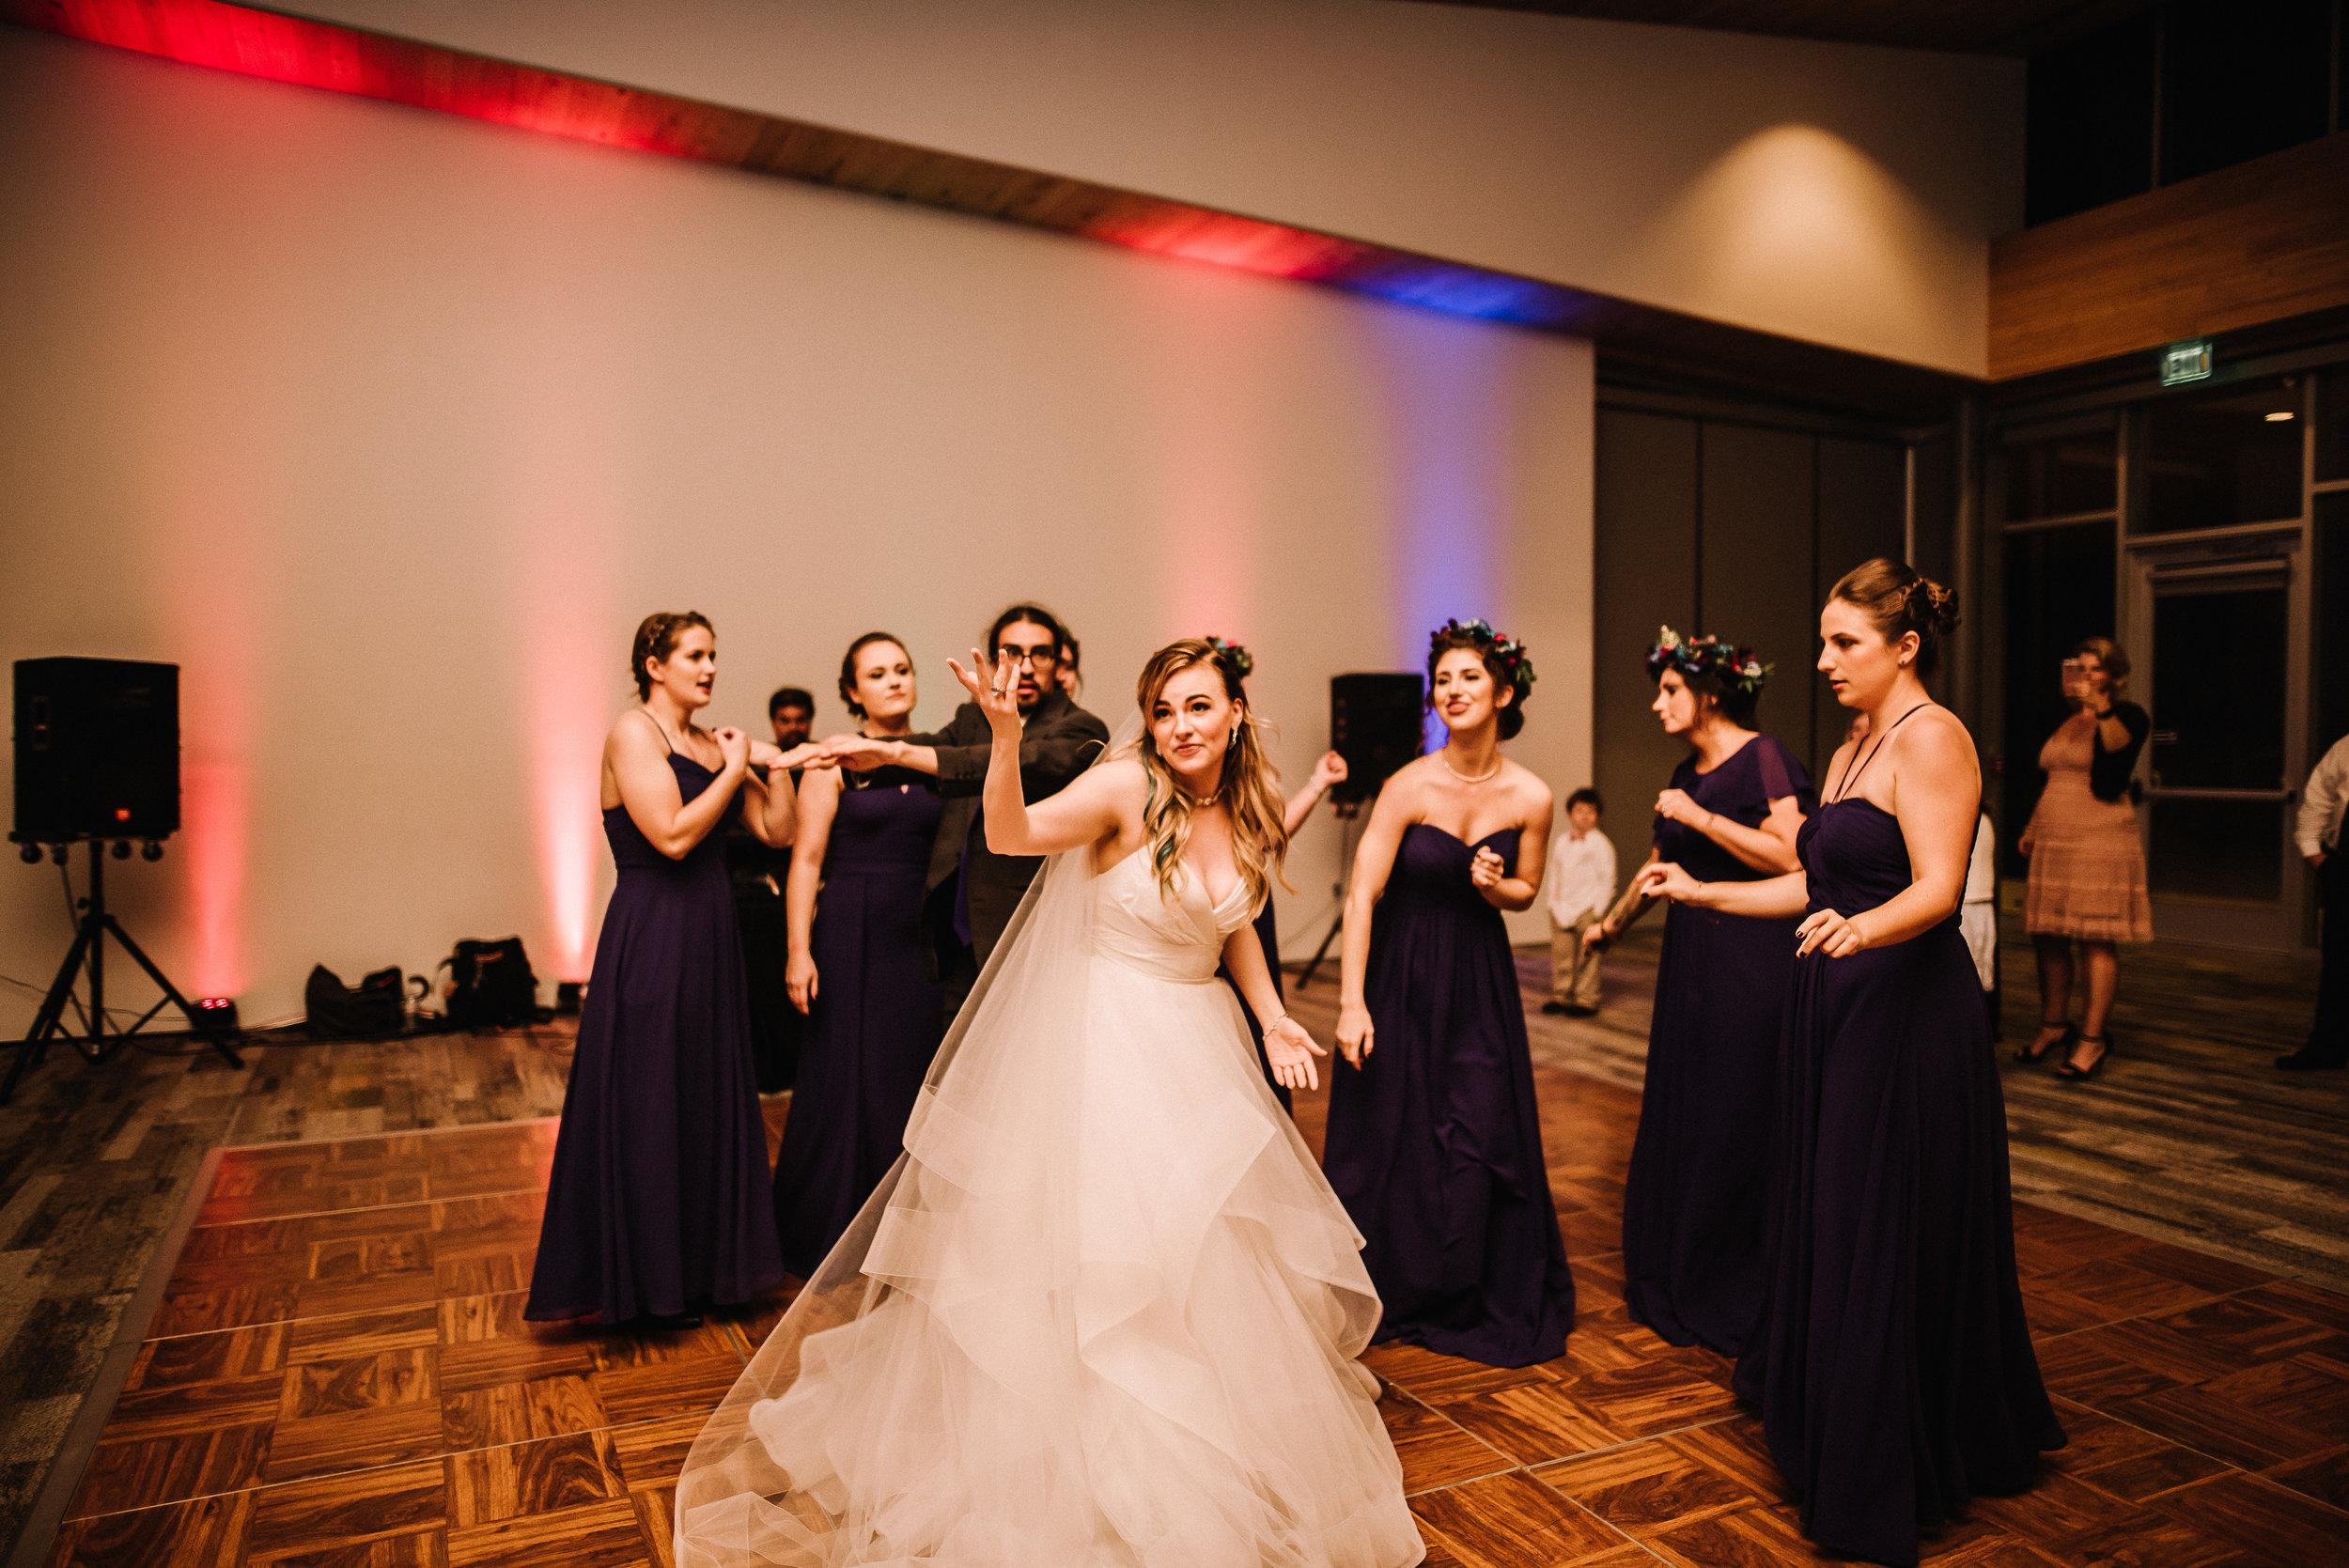 Lucchesi-Wedding_Shelby-Farms_Ashley-Benham-Photography-866.jpg